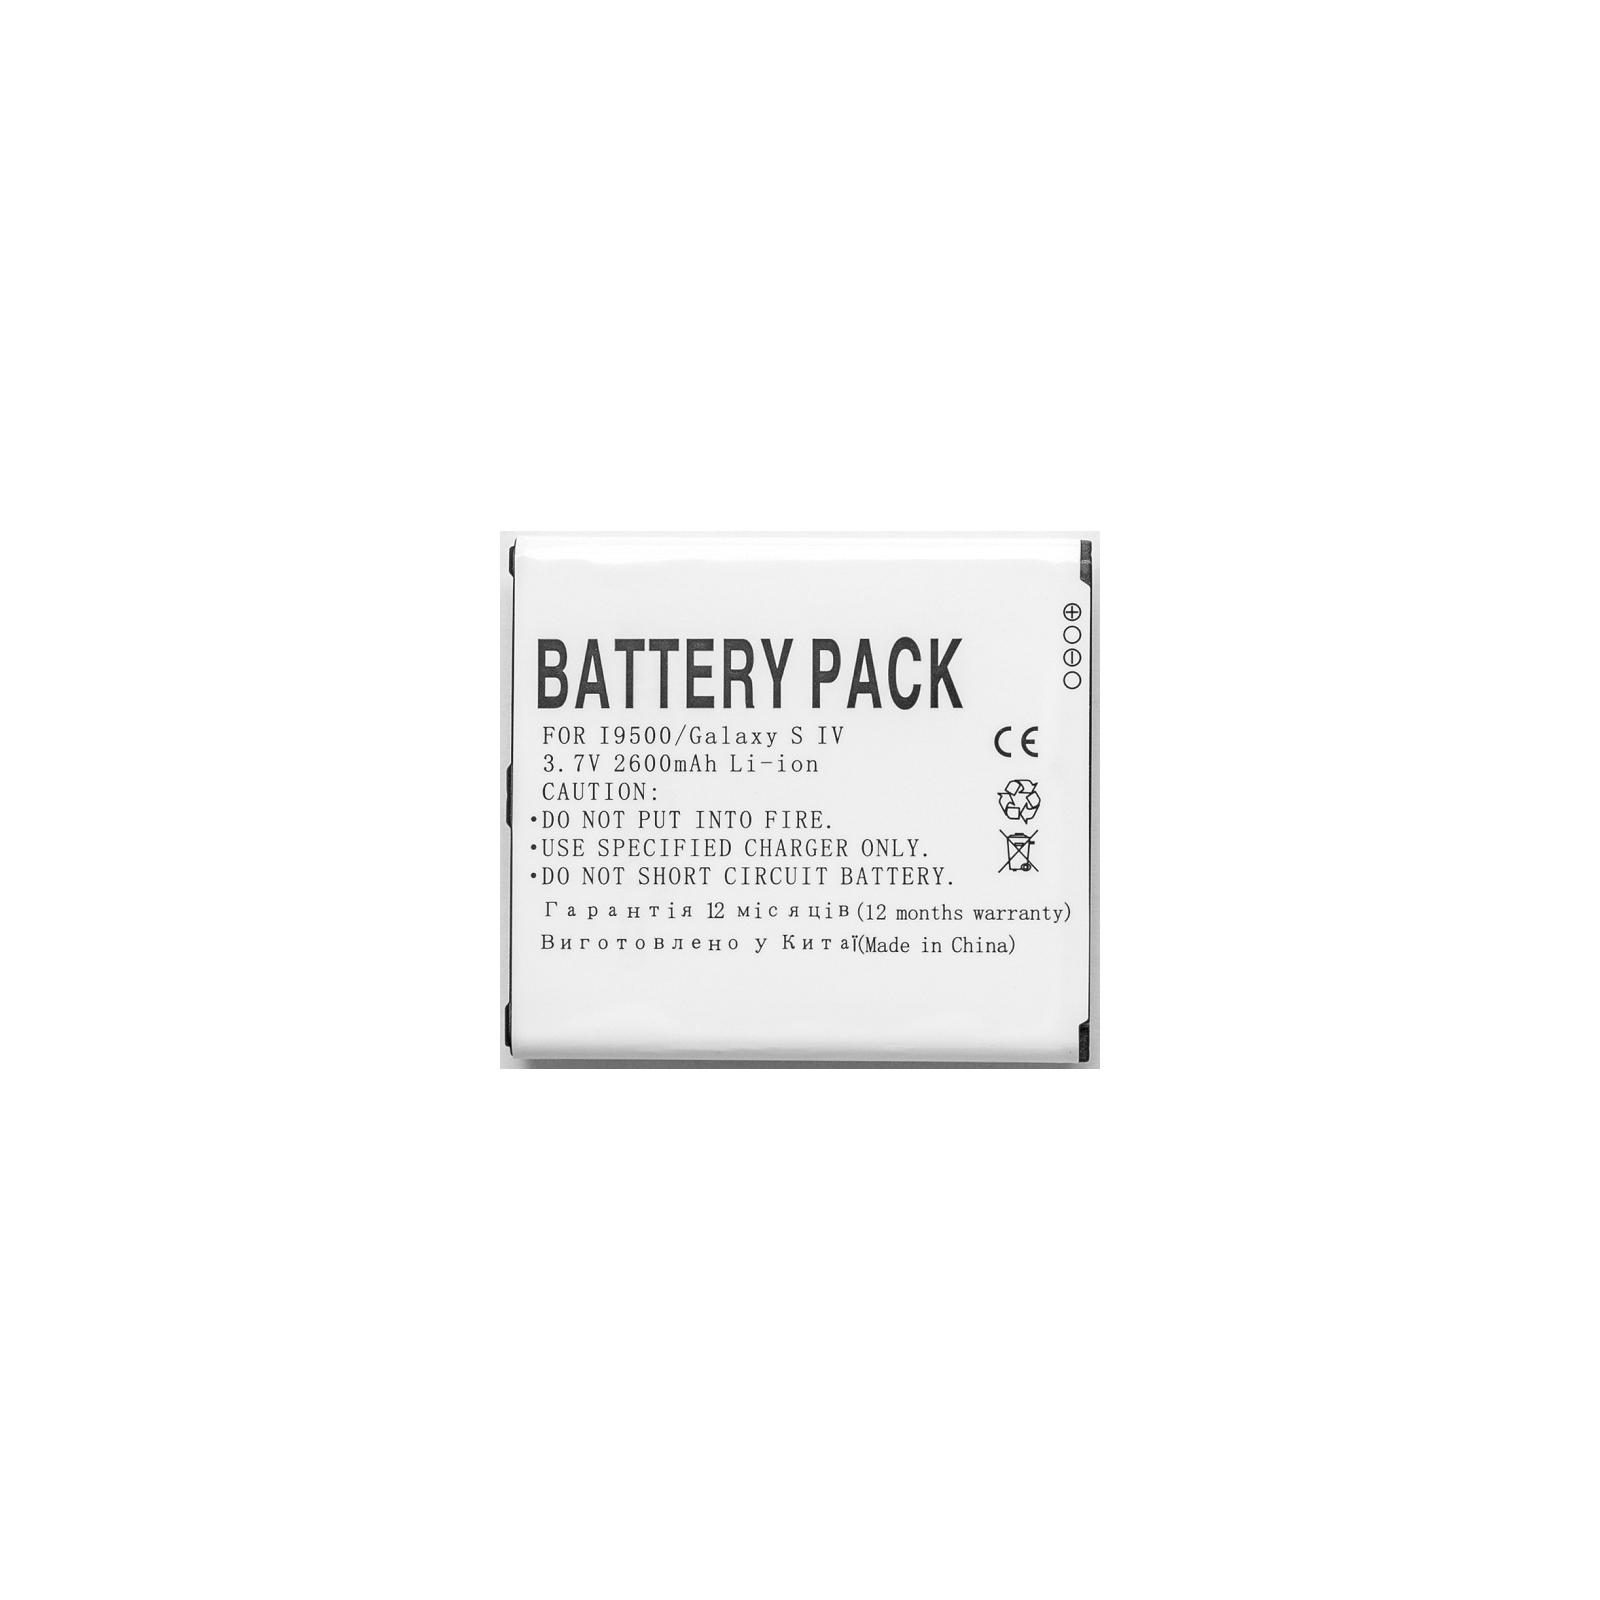 Аккумуляторная батарея PowerPlant Samsung i9500 (Galaxy S IV) (DV00DV6112) изображение 2